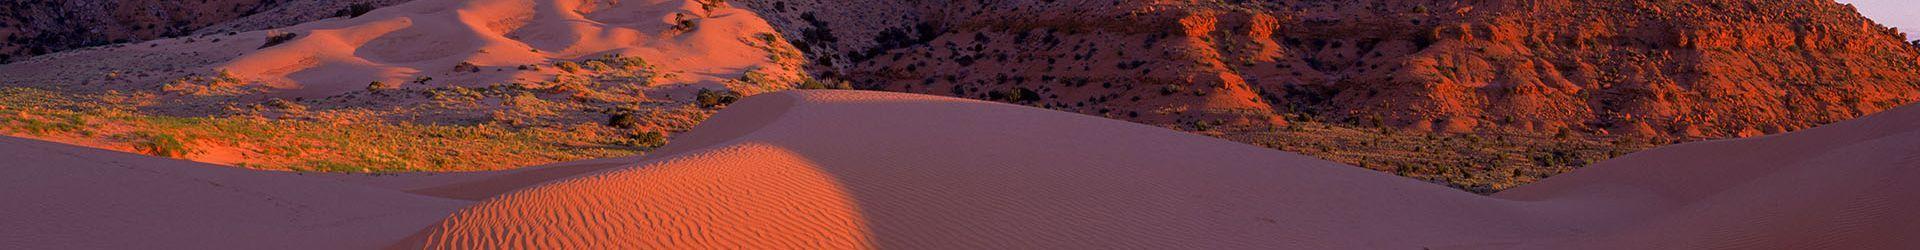 Dunes in Arizona